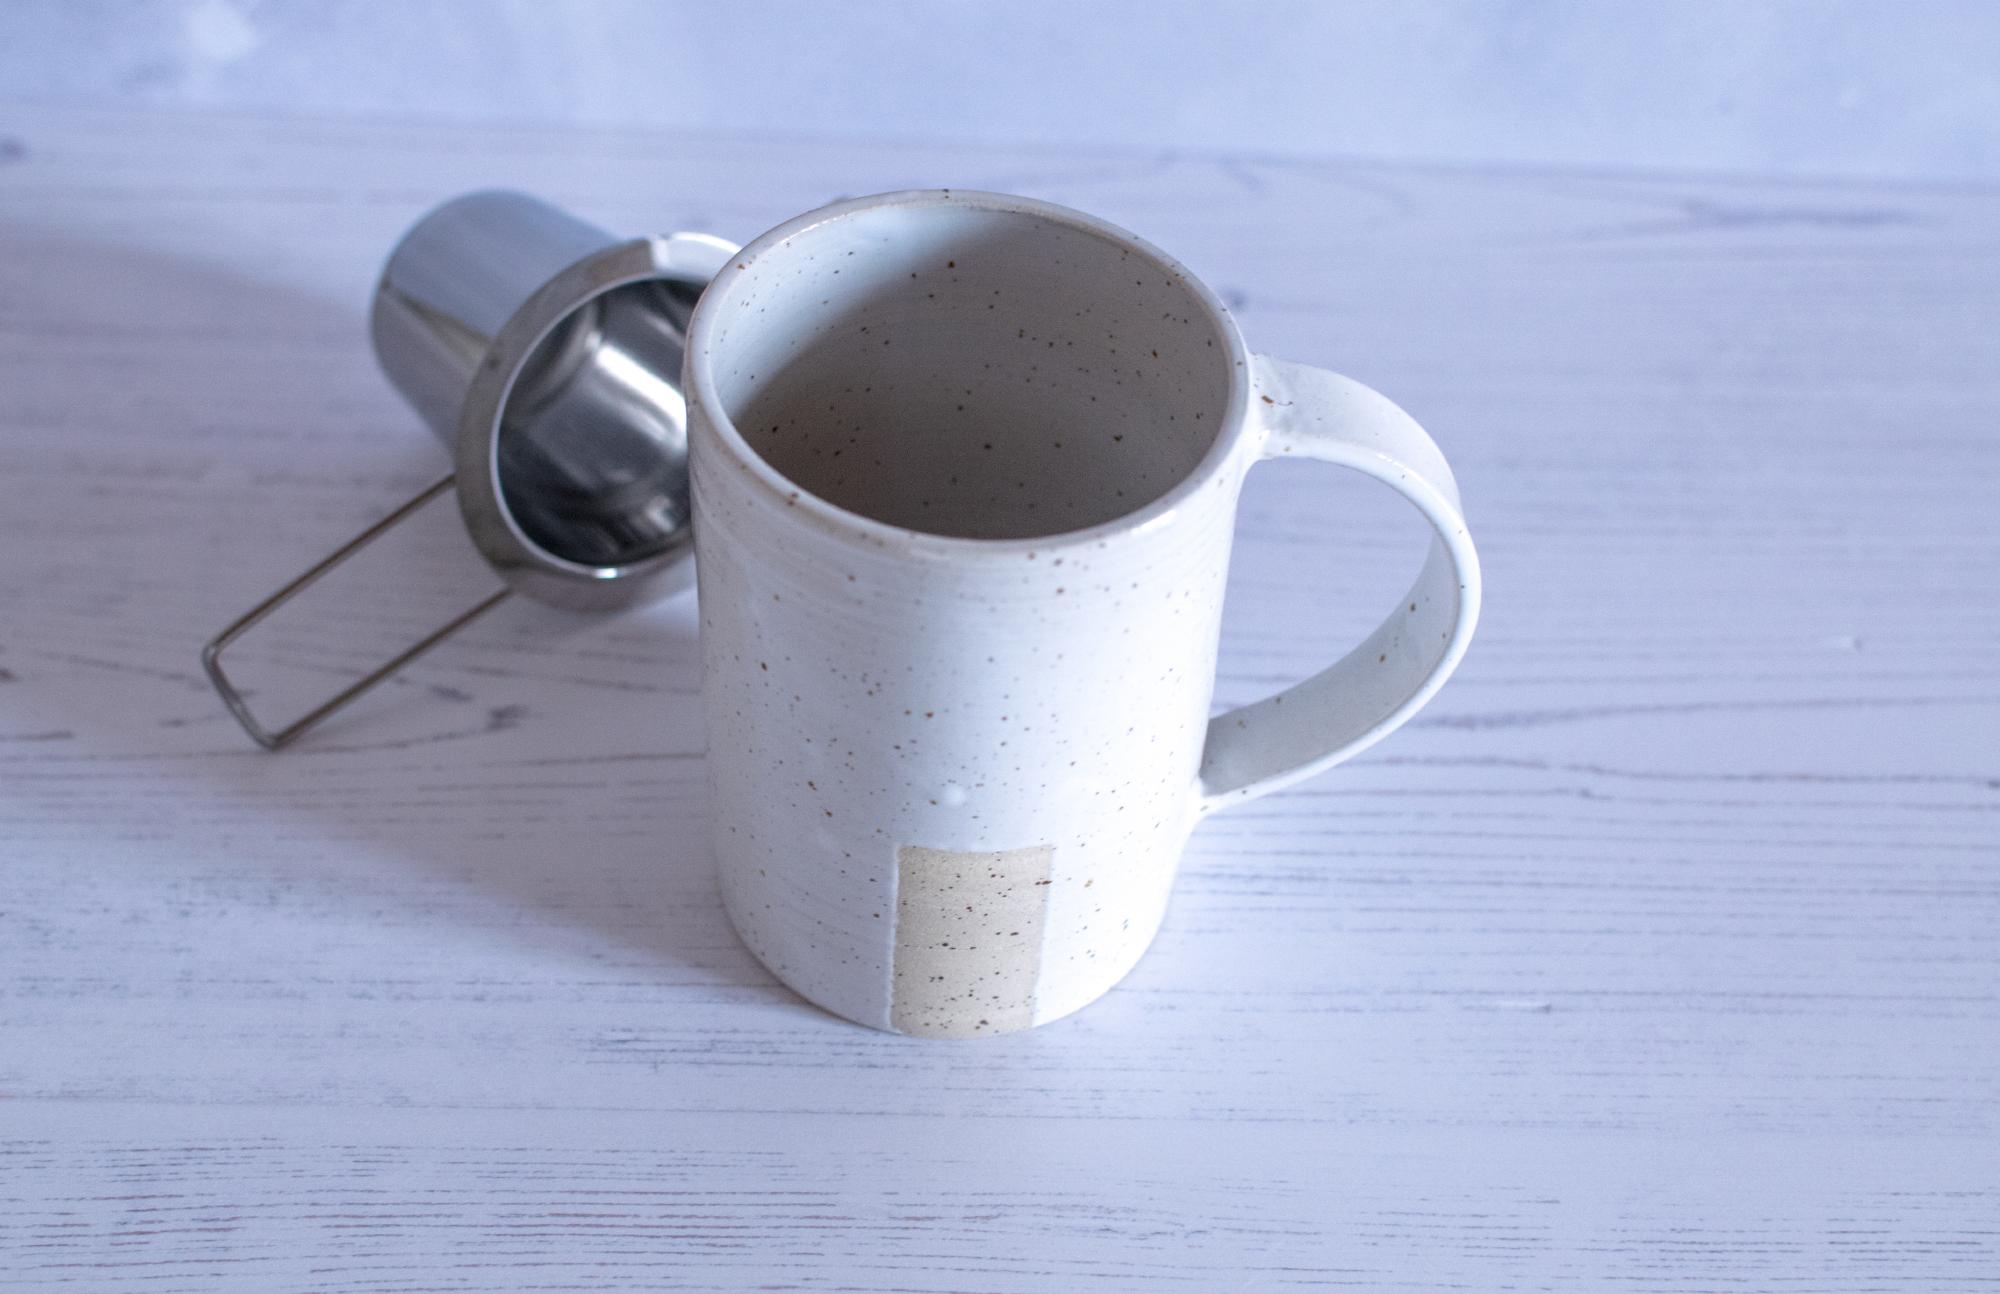 onigiri mug - primo fuoco